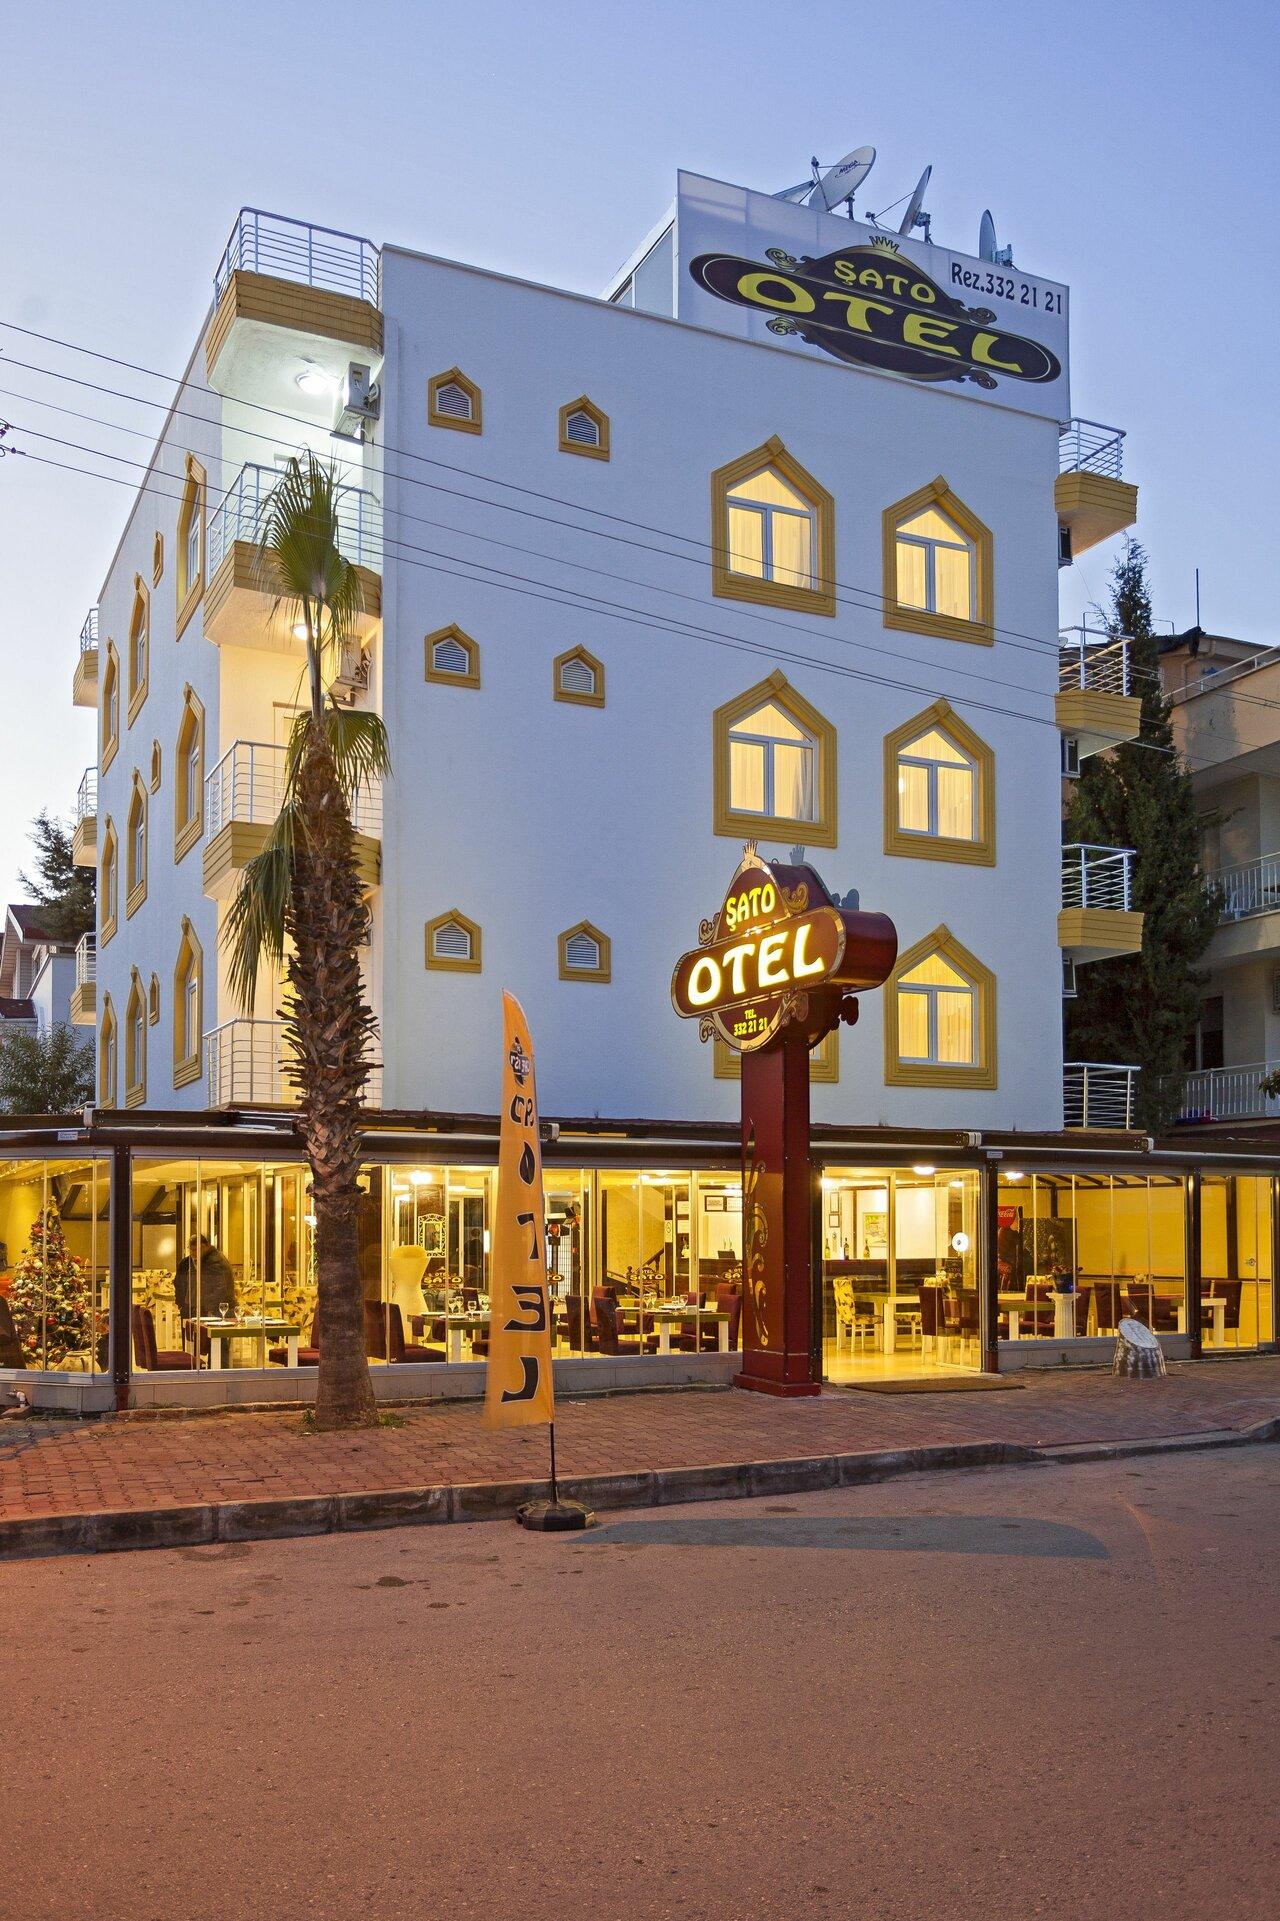 Sato Hotel Lara